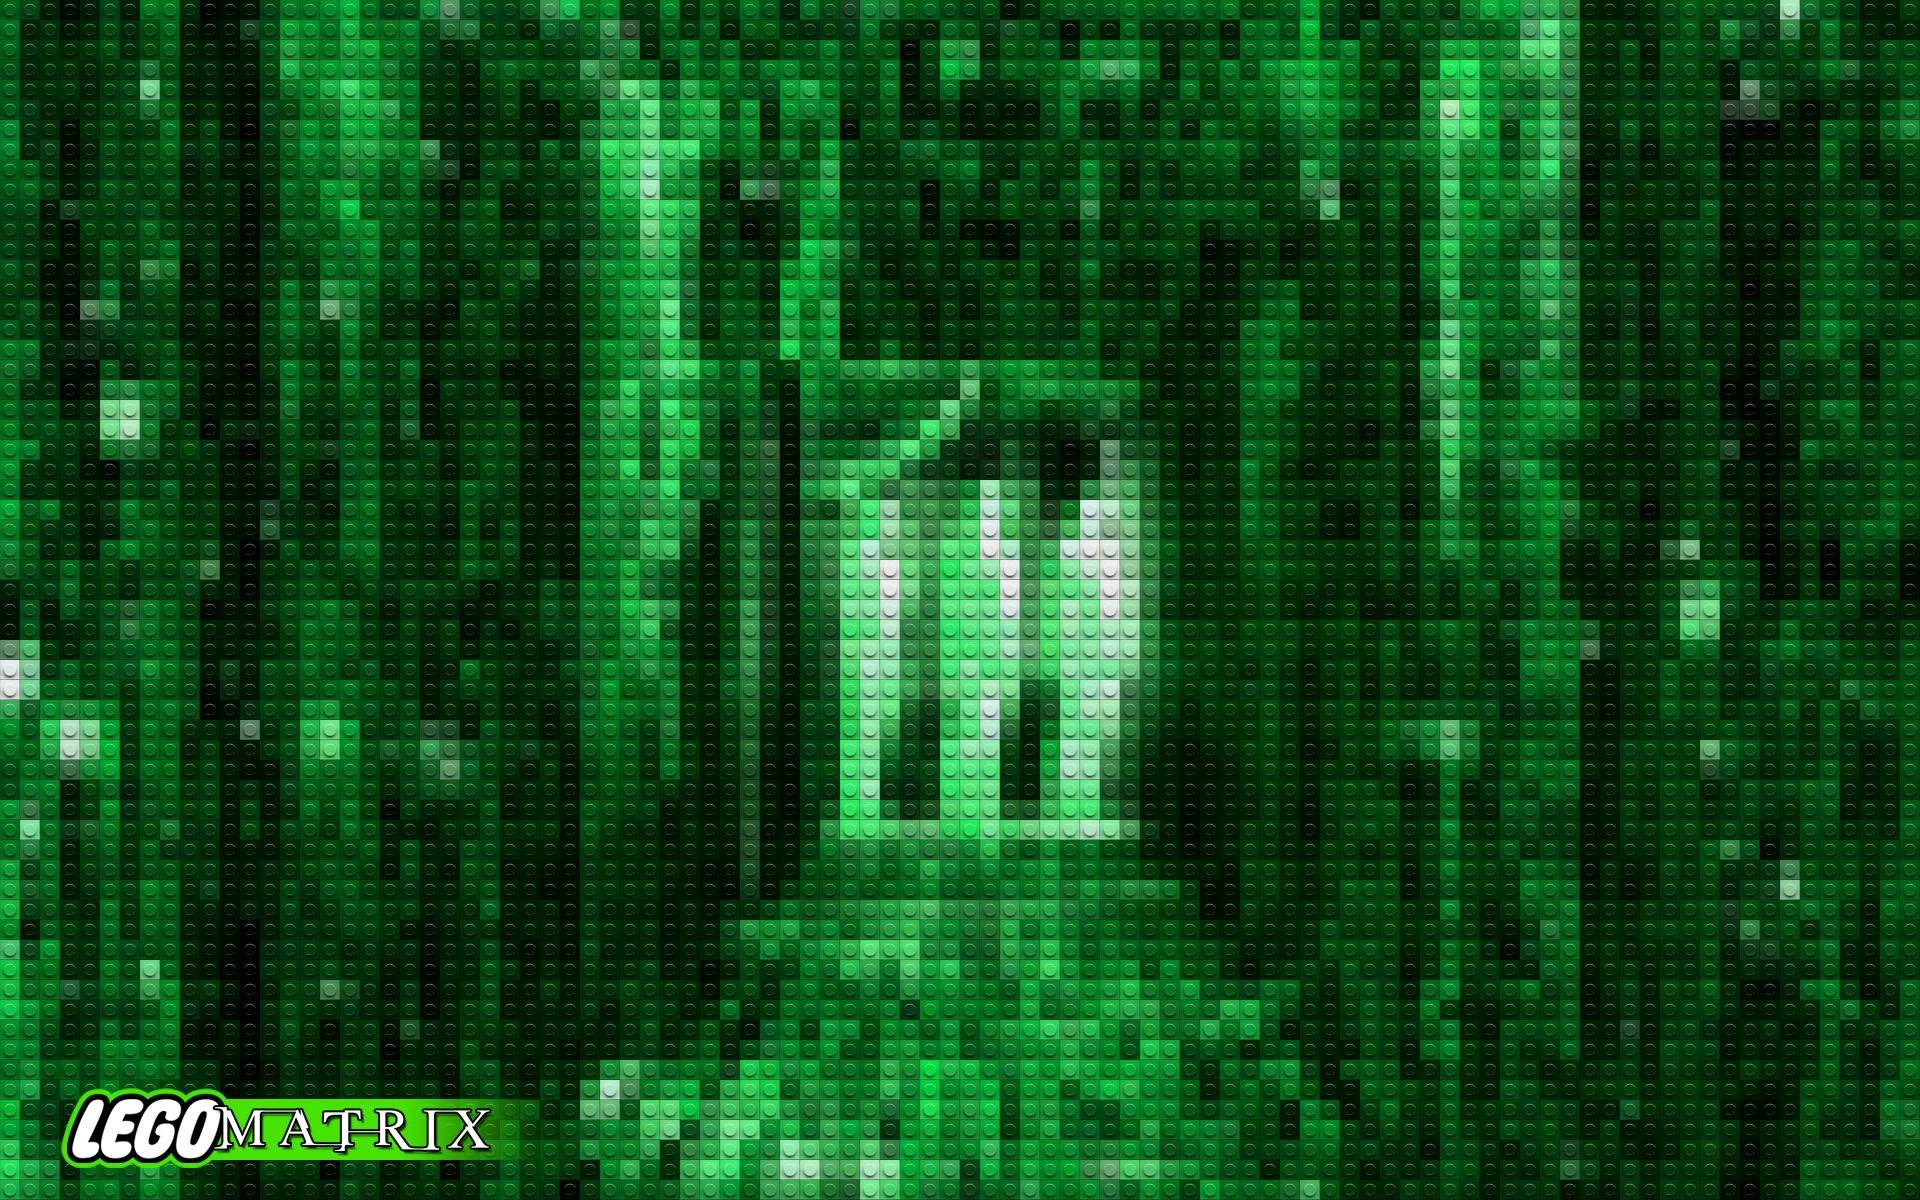 Matrix Wallpaper Animated Iphone Matrix Backgrounds 69 Images